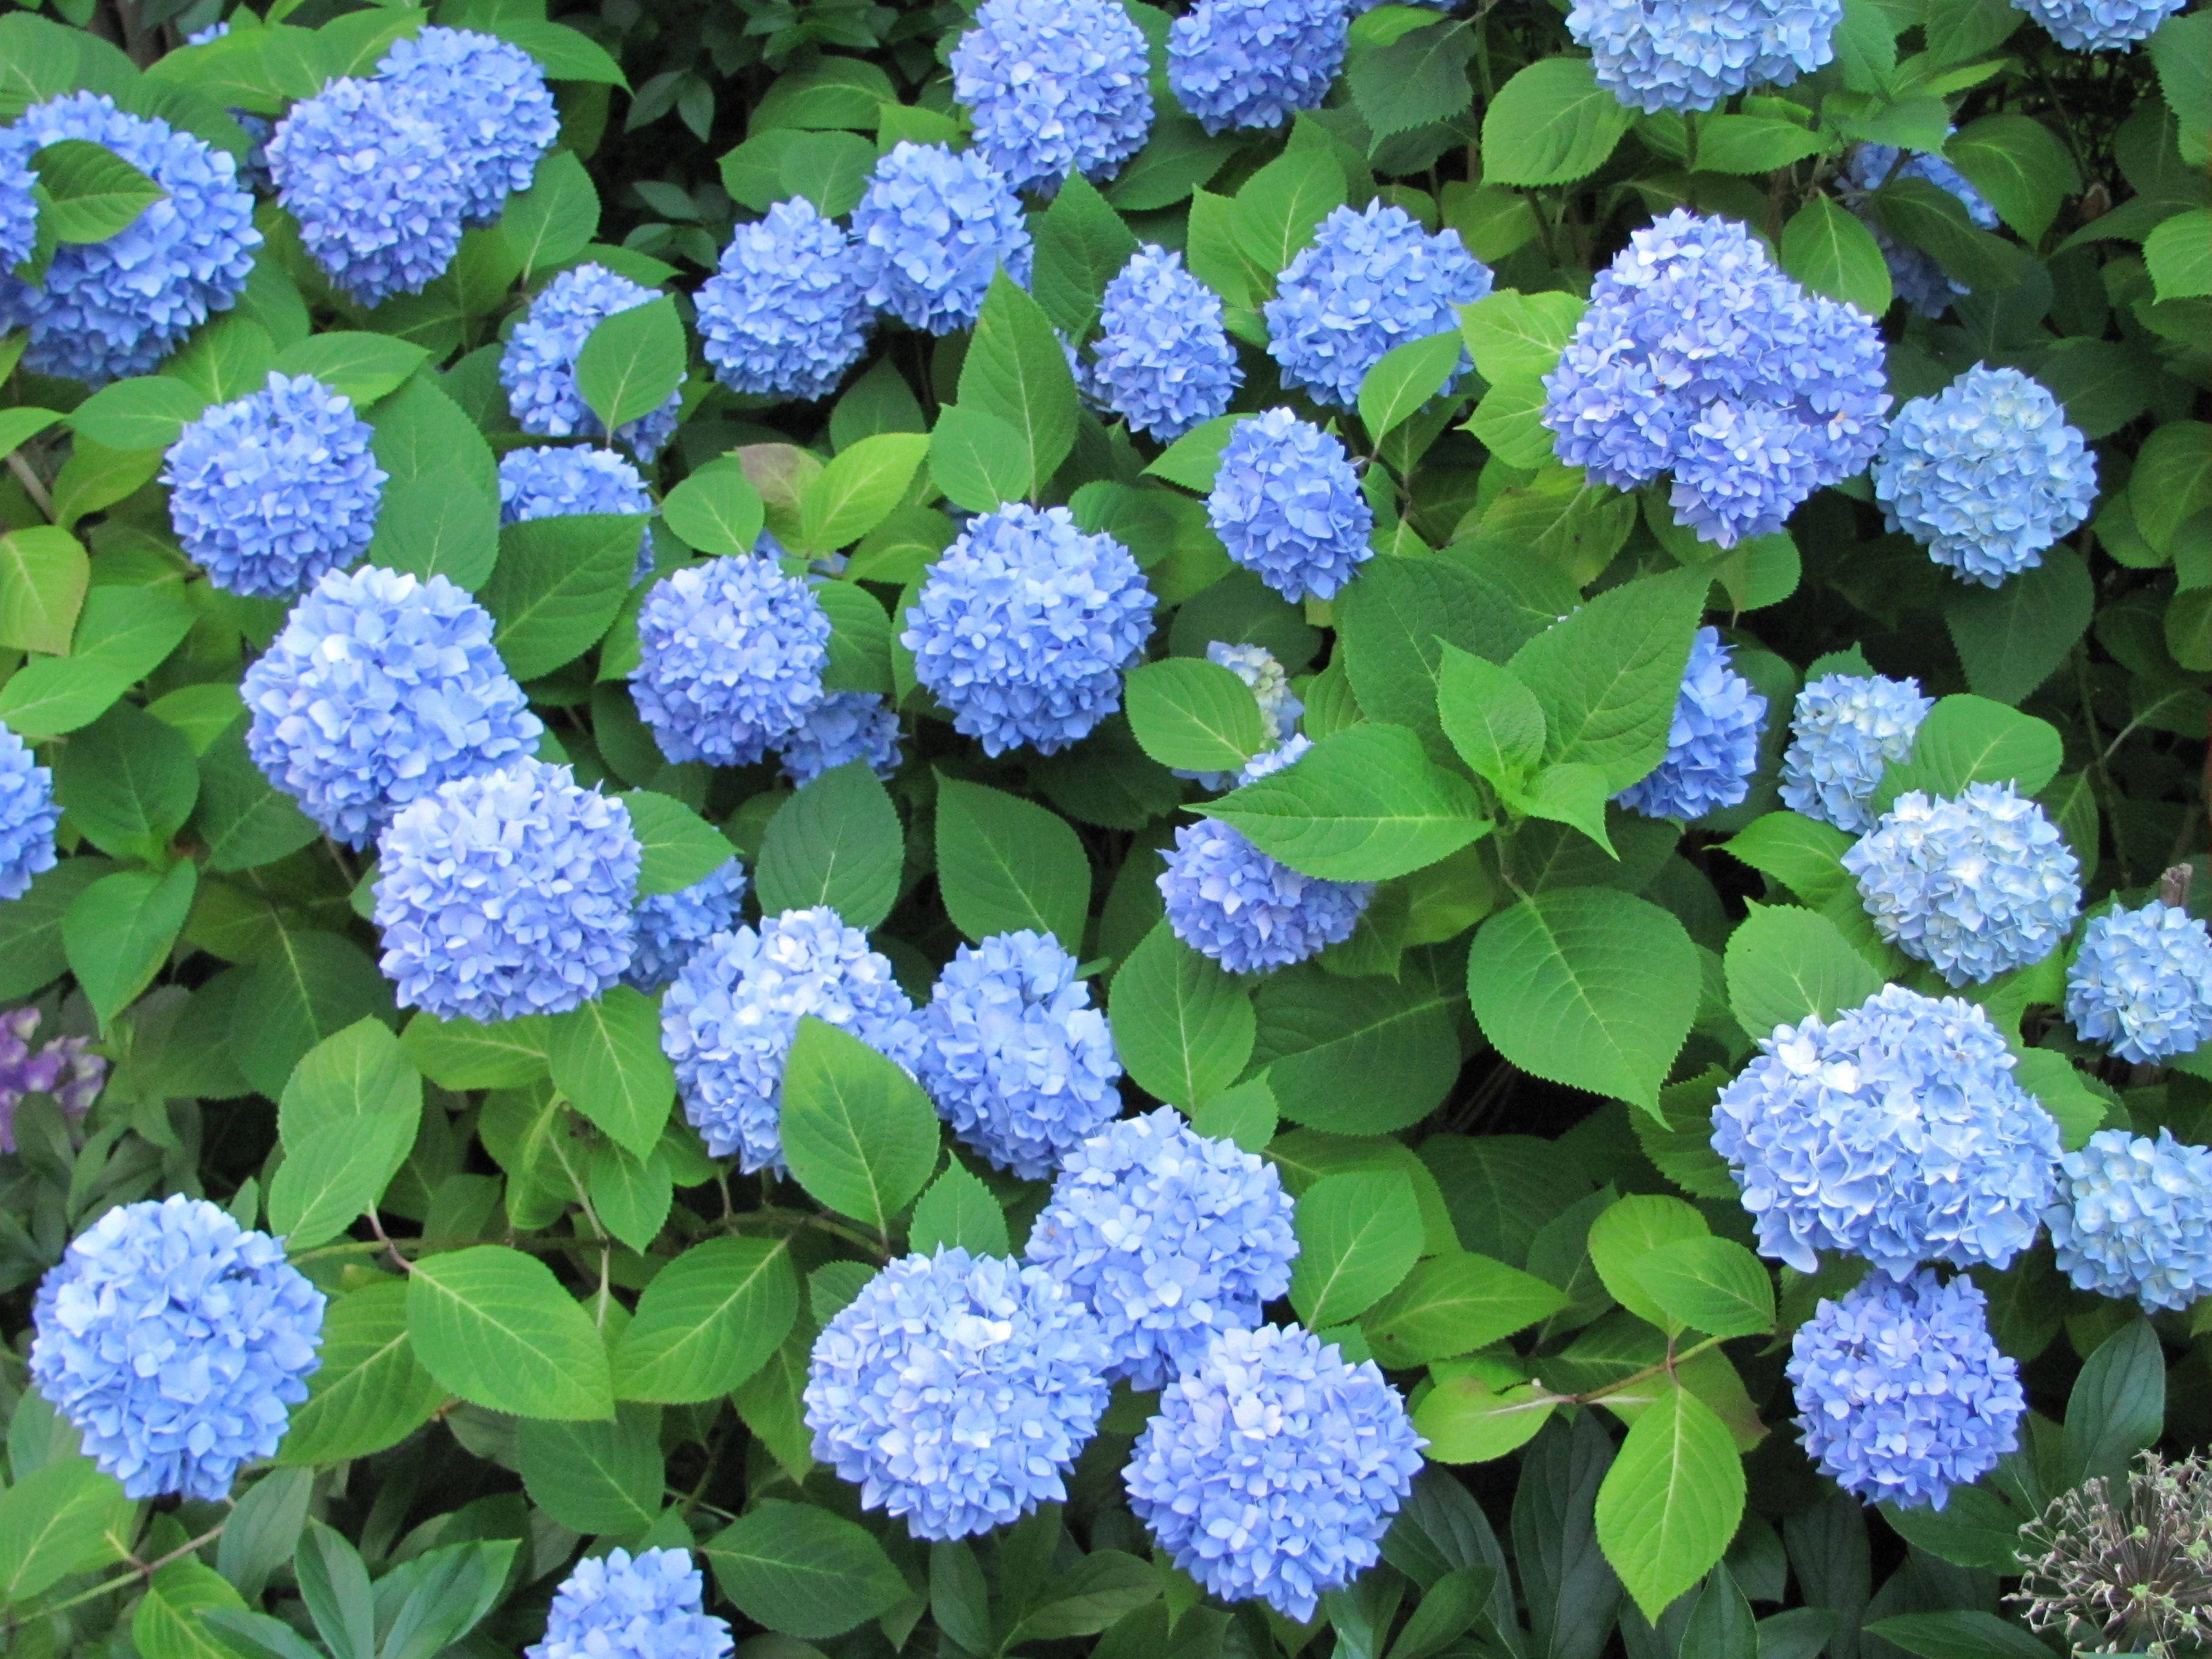 Hydrangea Nikko Blue Stays Blue All Summer Long Despite It S Soil Ph Blooms Early Mid Nikko Blue Hydrangea Blue Hydrangea Plant Blue Hydrangea Flowers